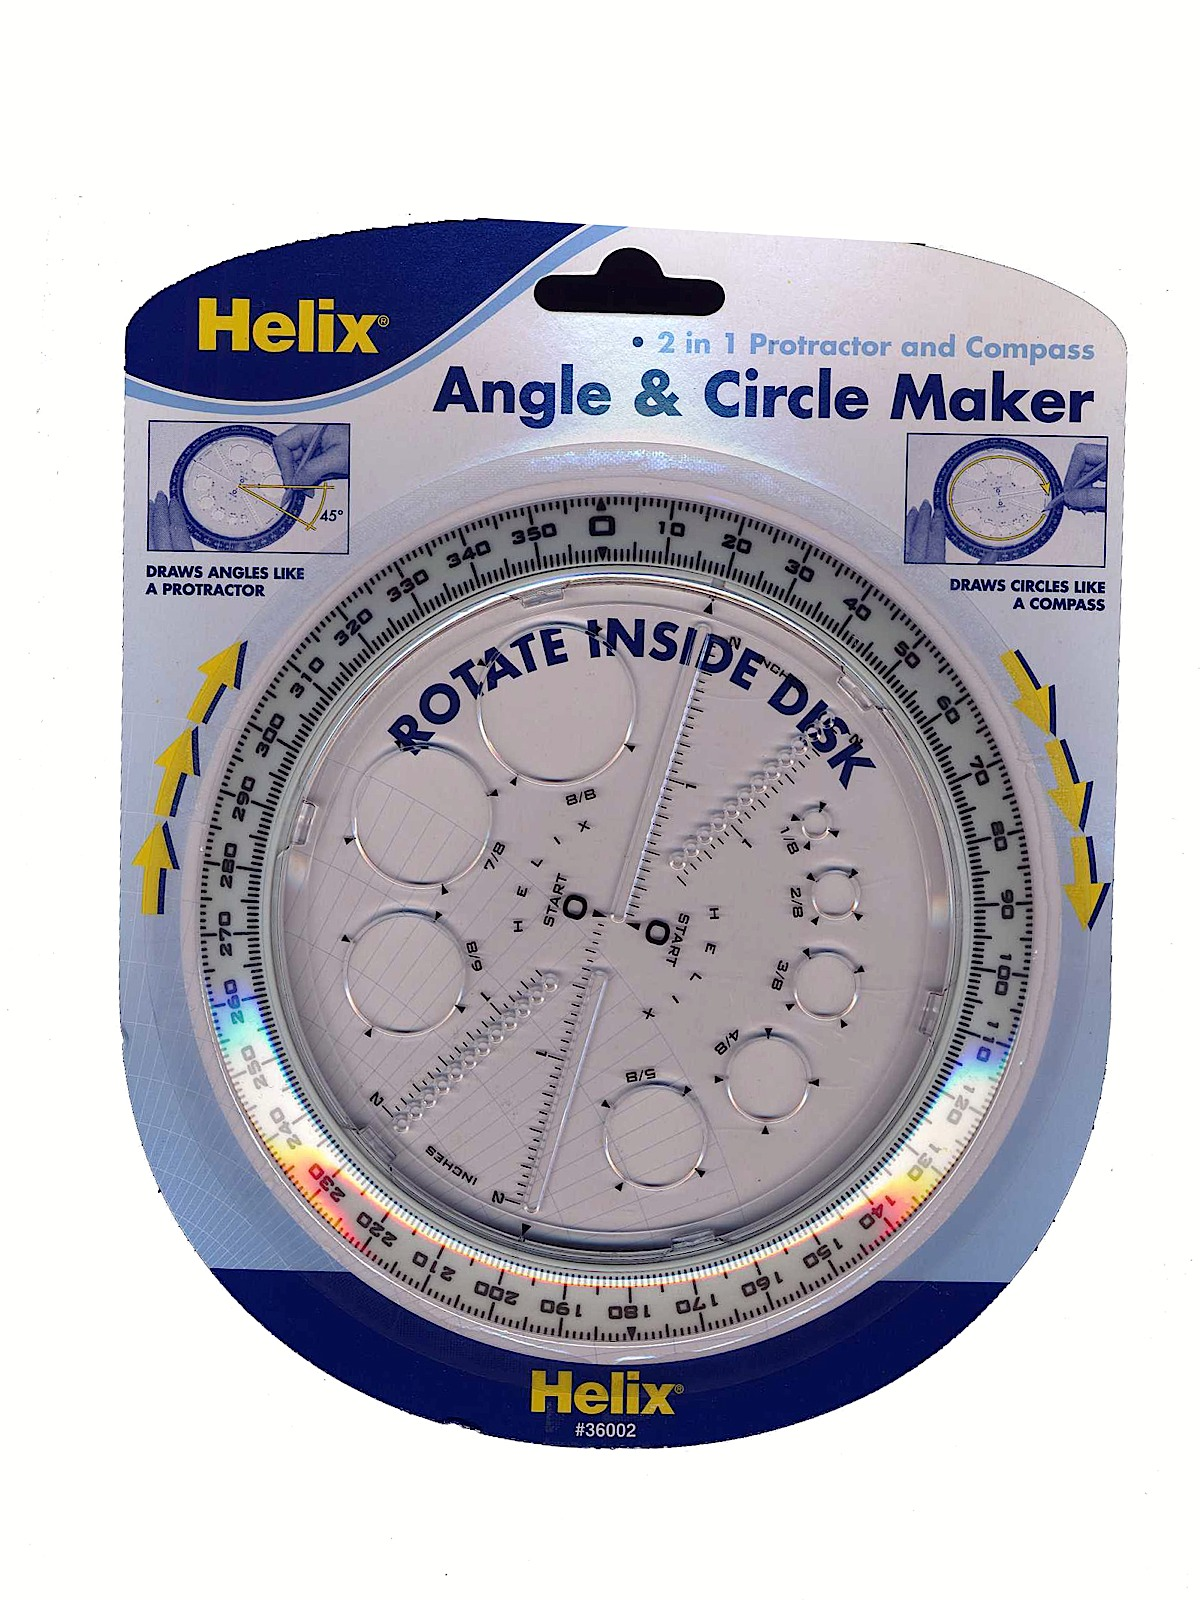 Angle & Circle Maker